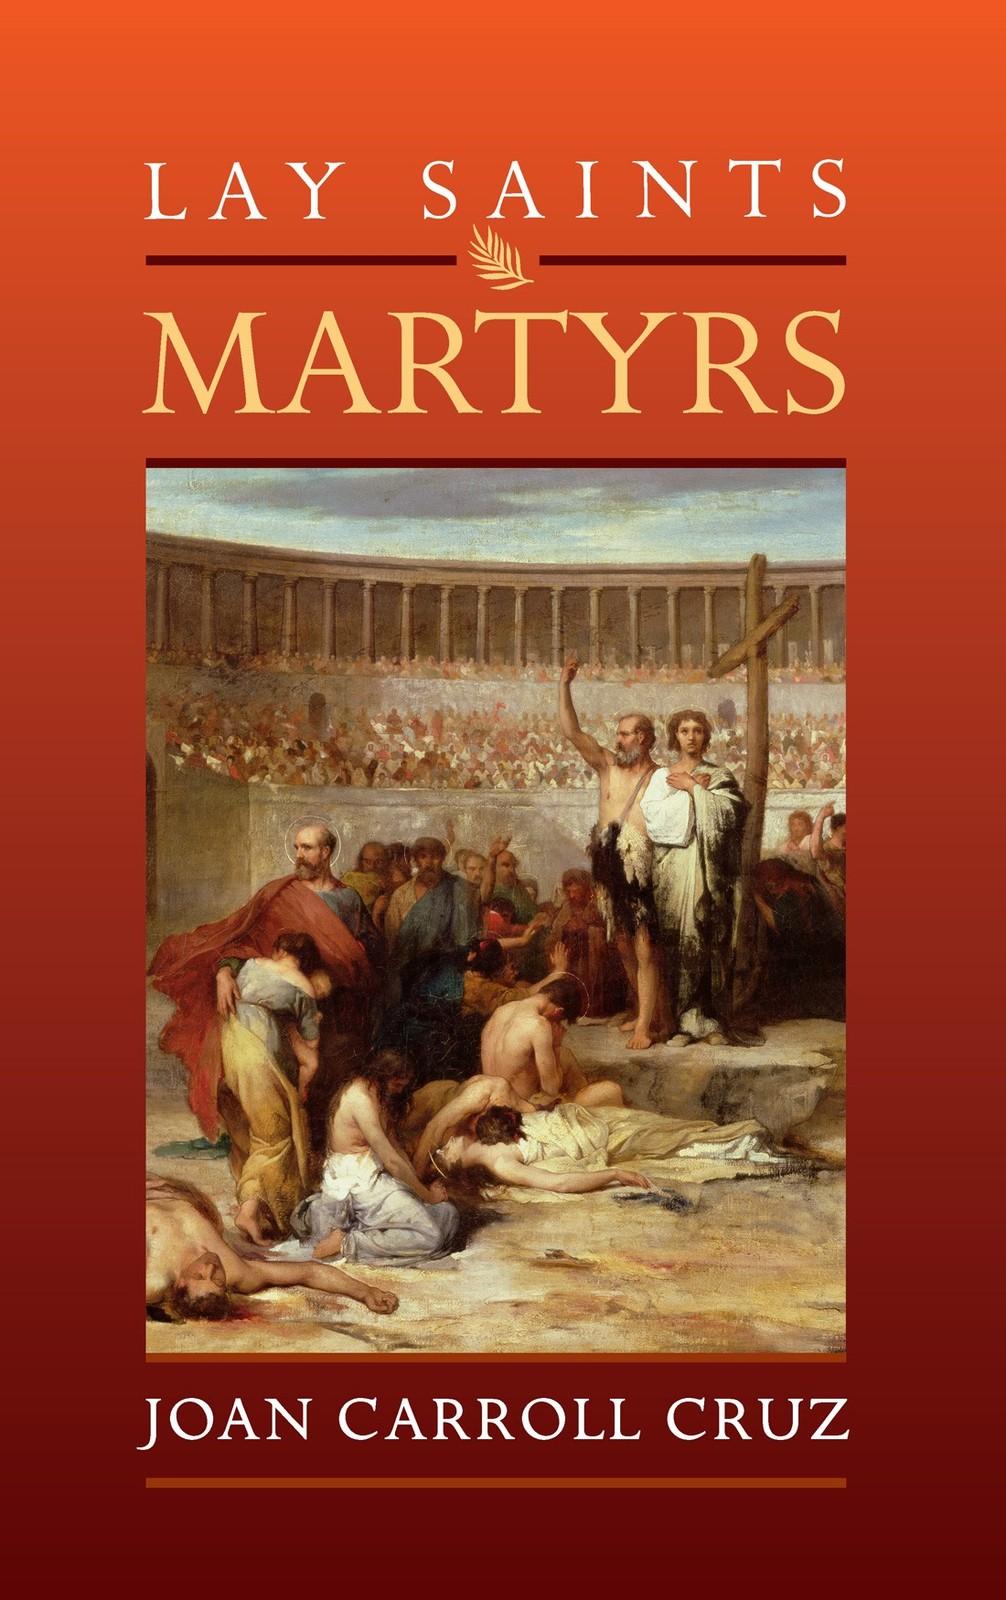 Lay saints martyrs